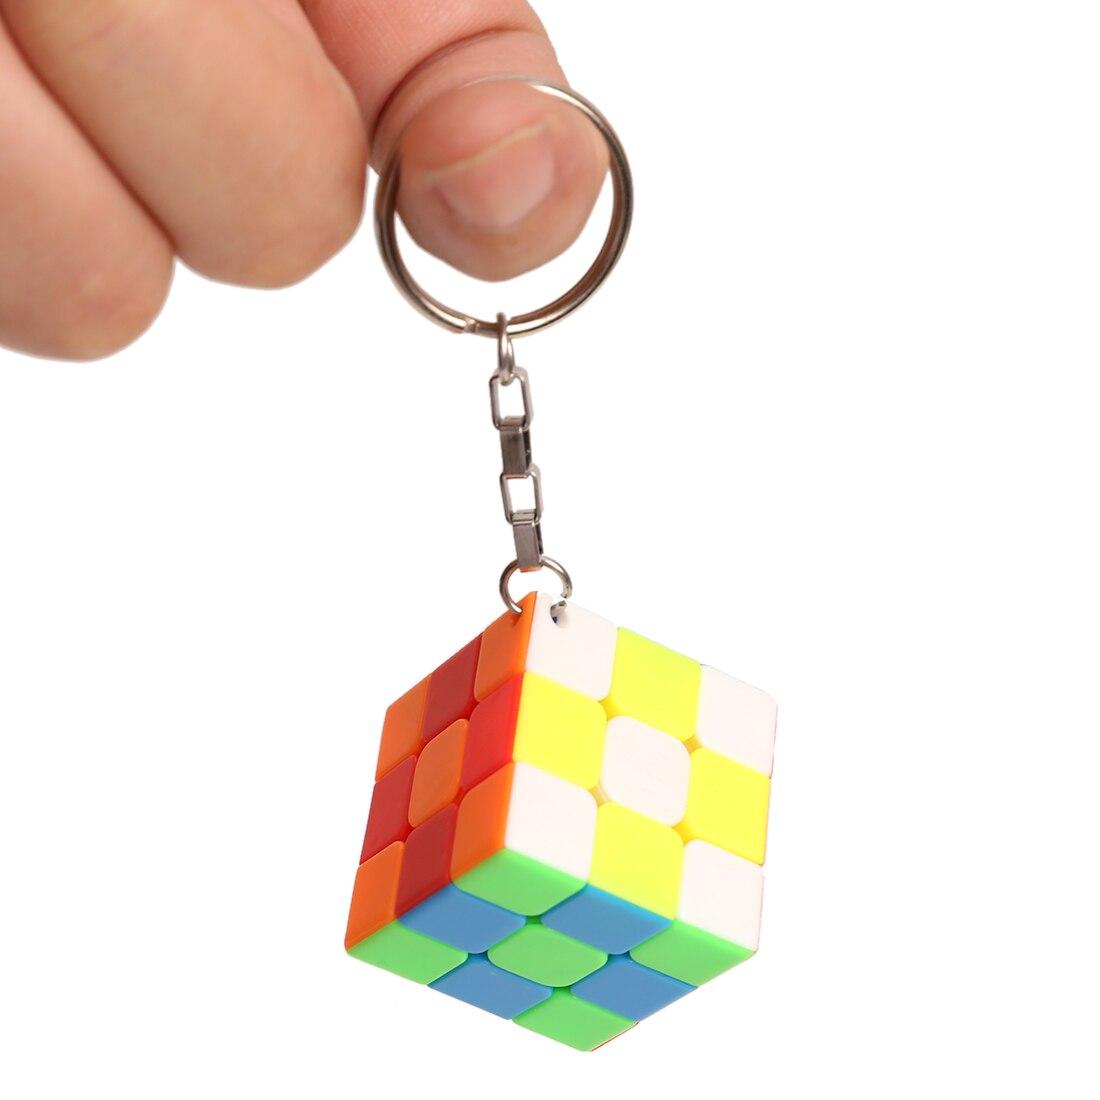 Z Key Chain Mini 3x3 Magic Cube Creative Cube Hang Decorations - Colorful ленинград